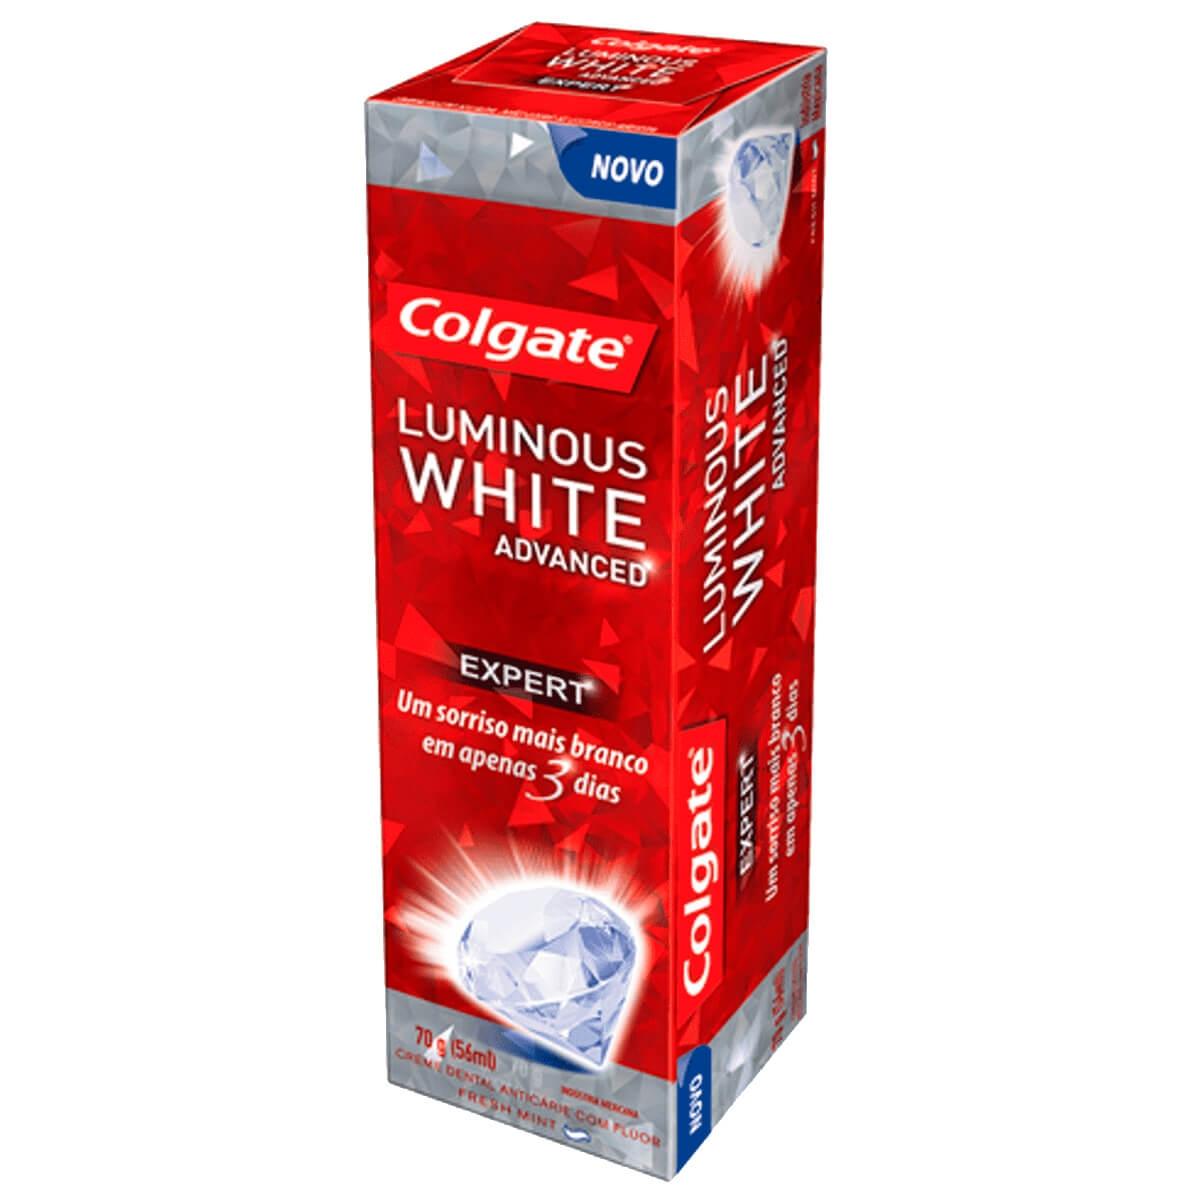 Colgate Creme Dental Luminous White Advanced 70g Droga Raia